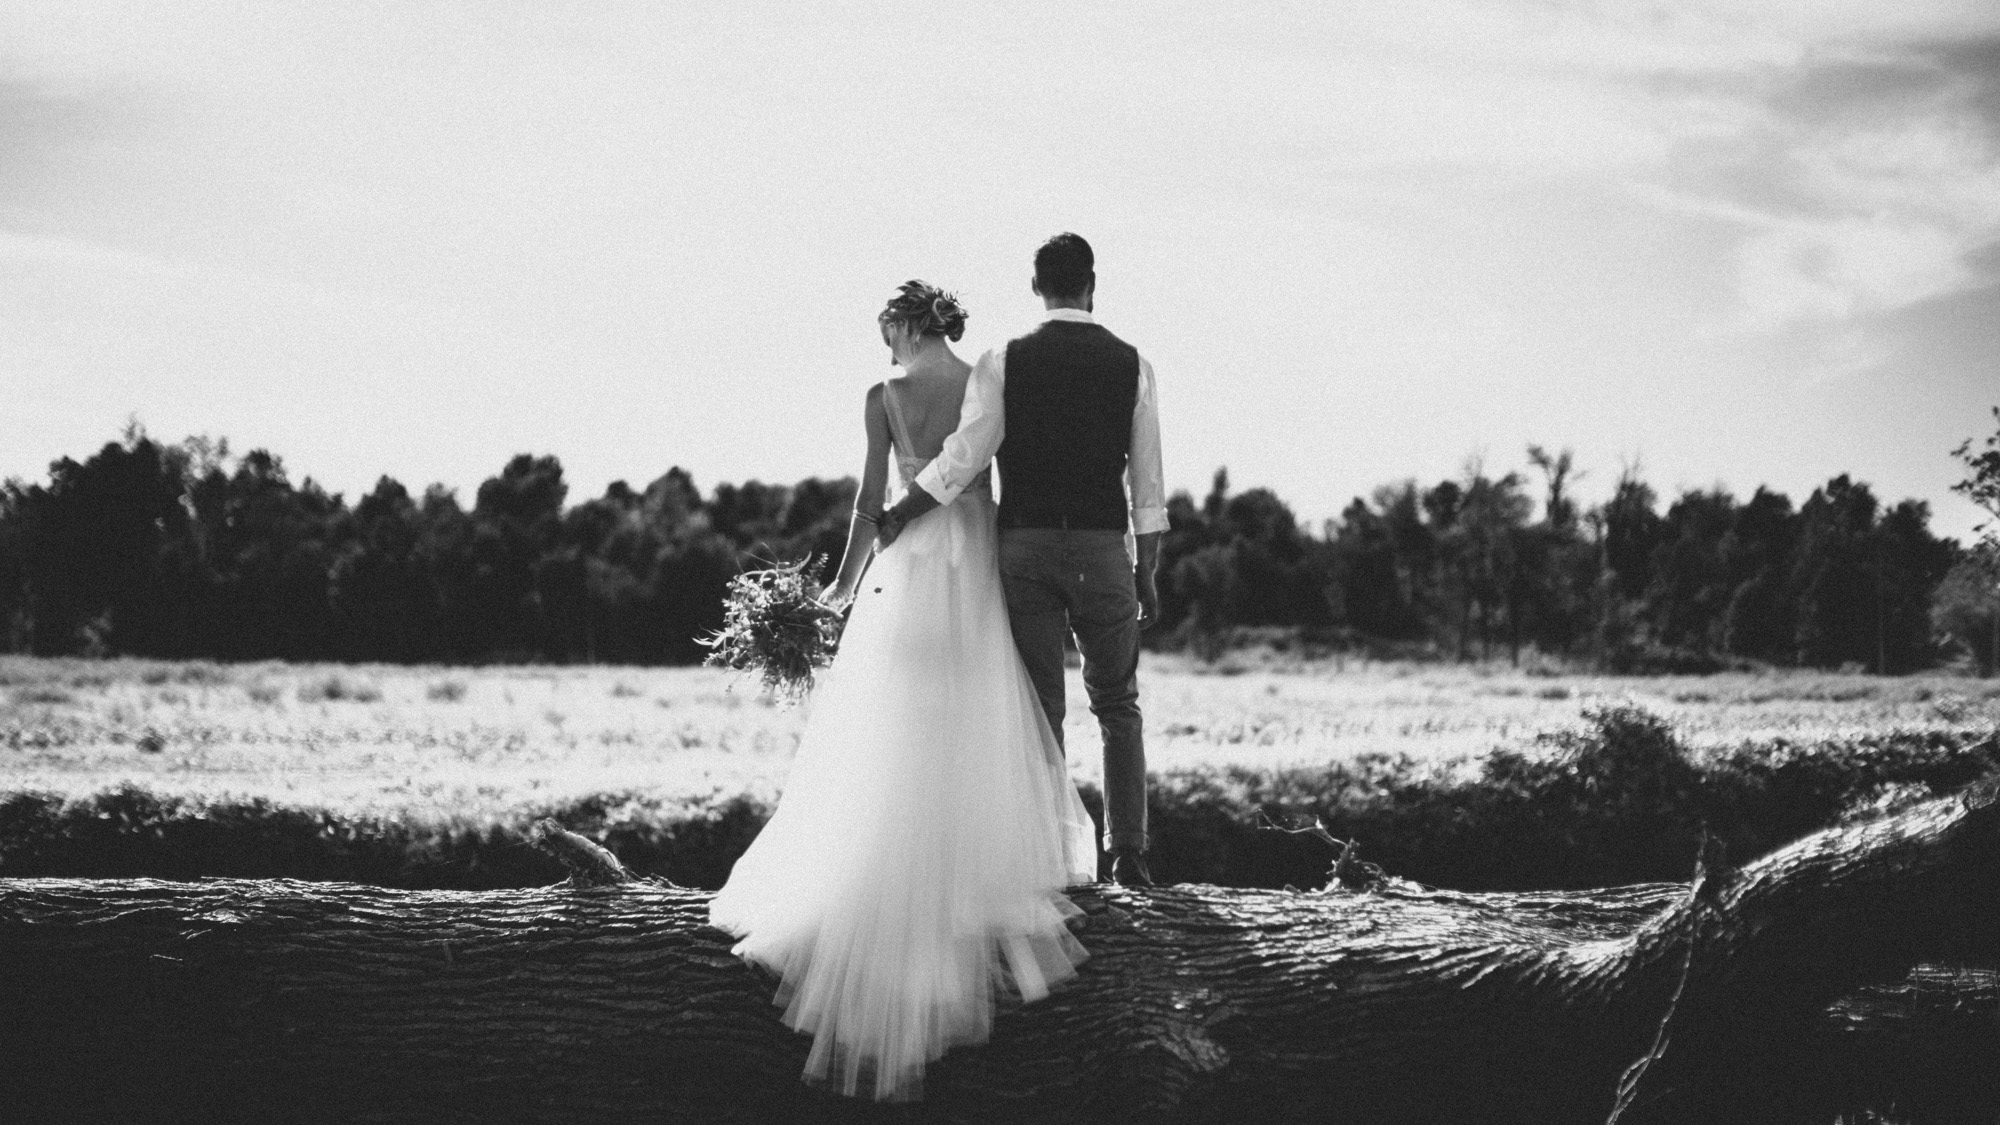 alec_vanderboom_springfield_missouri_wedding-0044.jpg